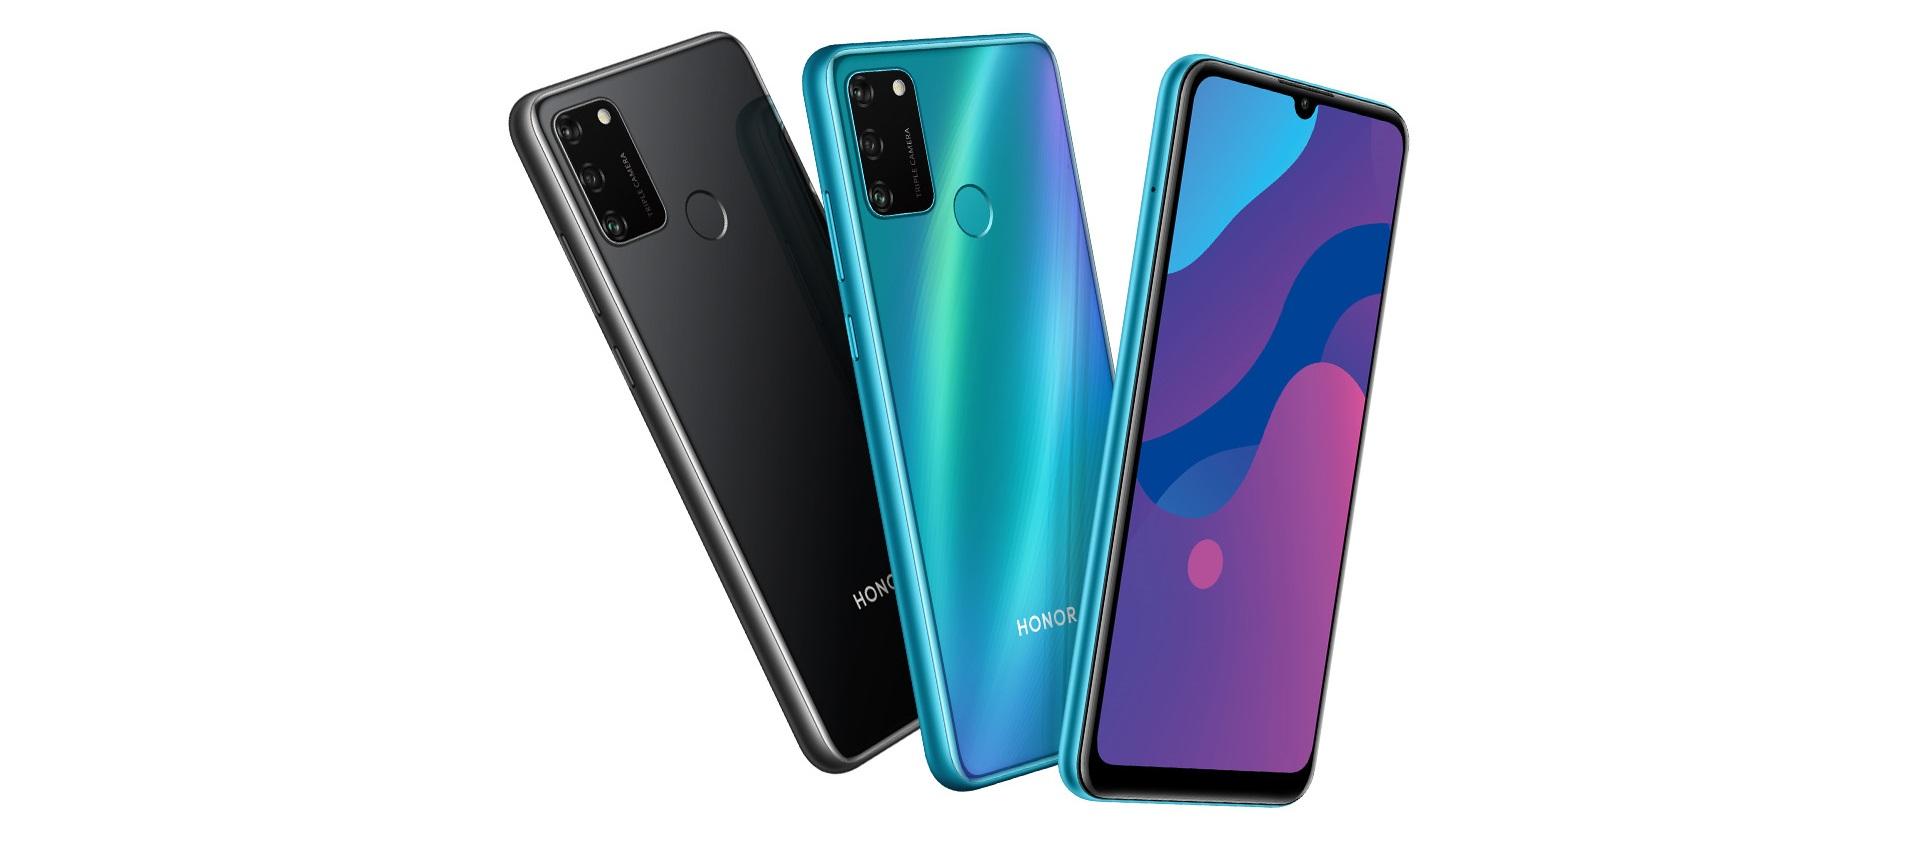 Honor 9A smartphone